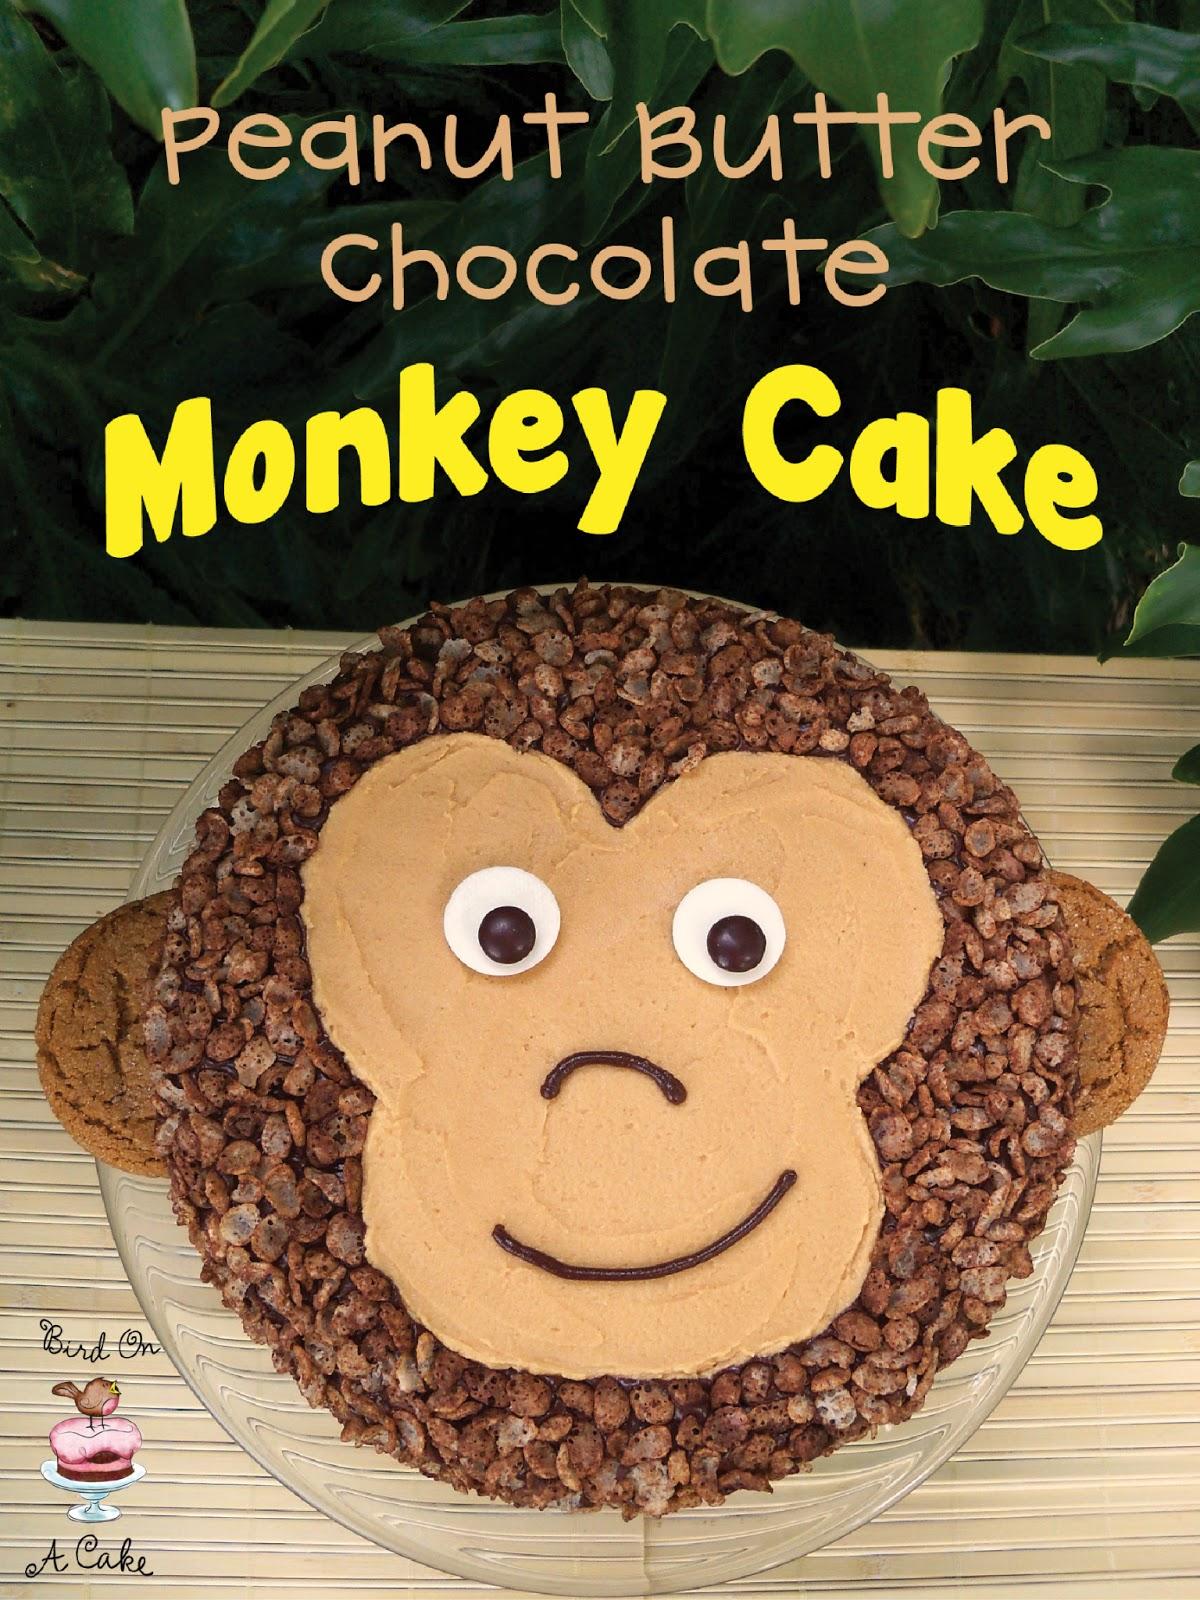 Bird On A Cake Peanut Butter Chocolate Monkey Cake